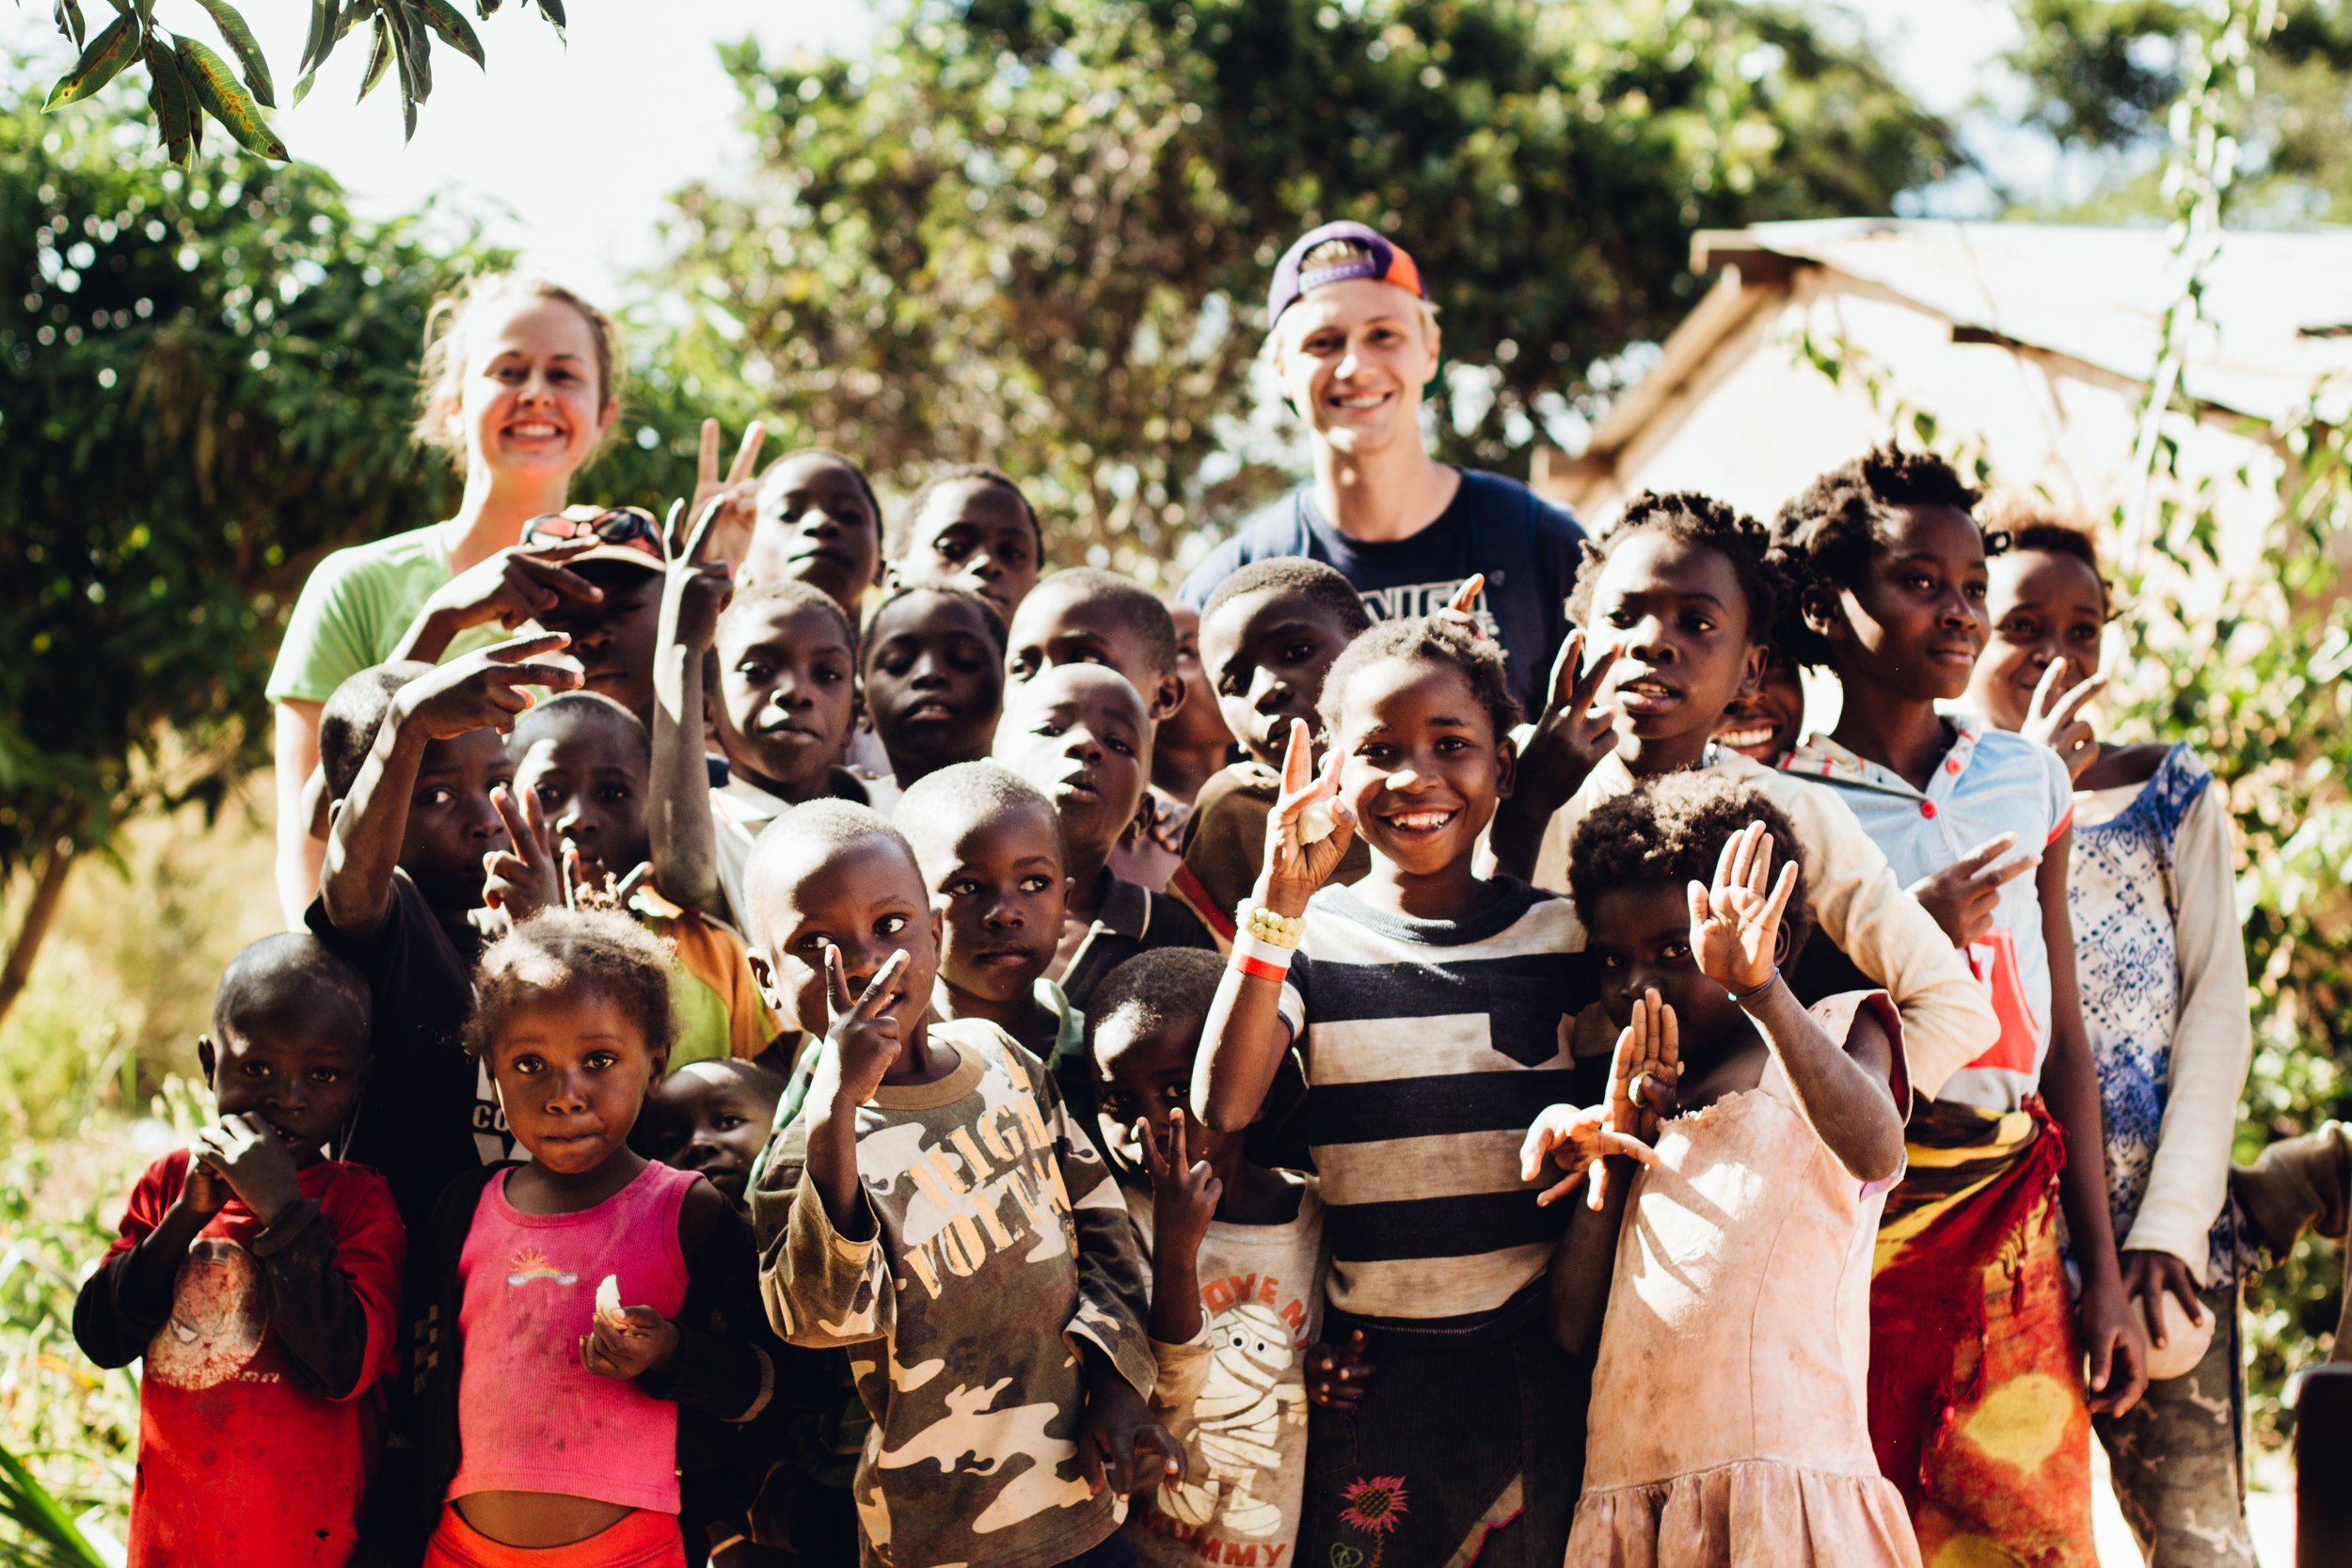 shadow-shine-pictures-grand-rapids-michigan-photographer-videographer-zambia-social-justice-nonprofit-cinematographer